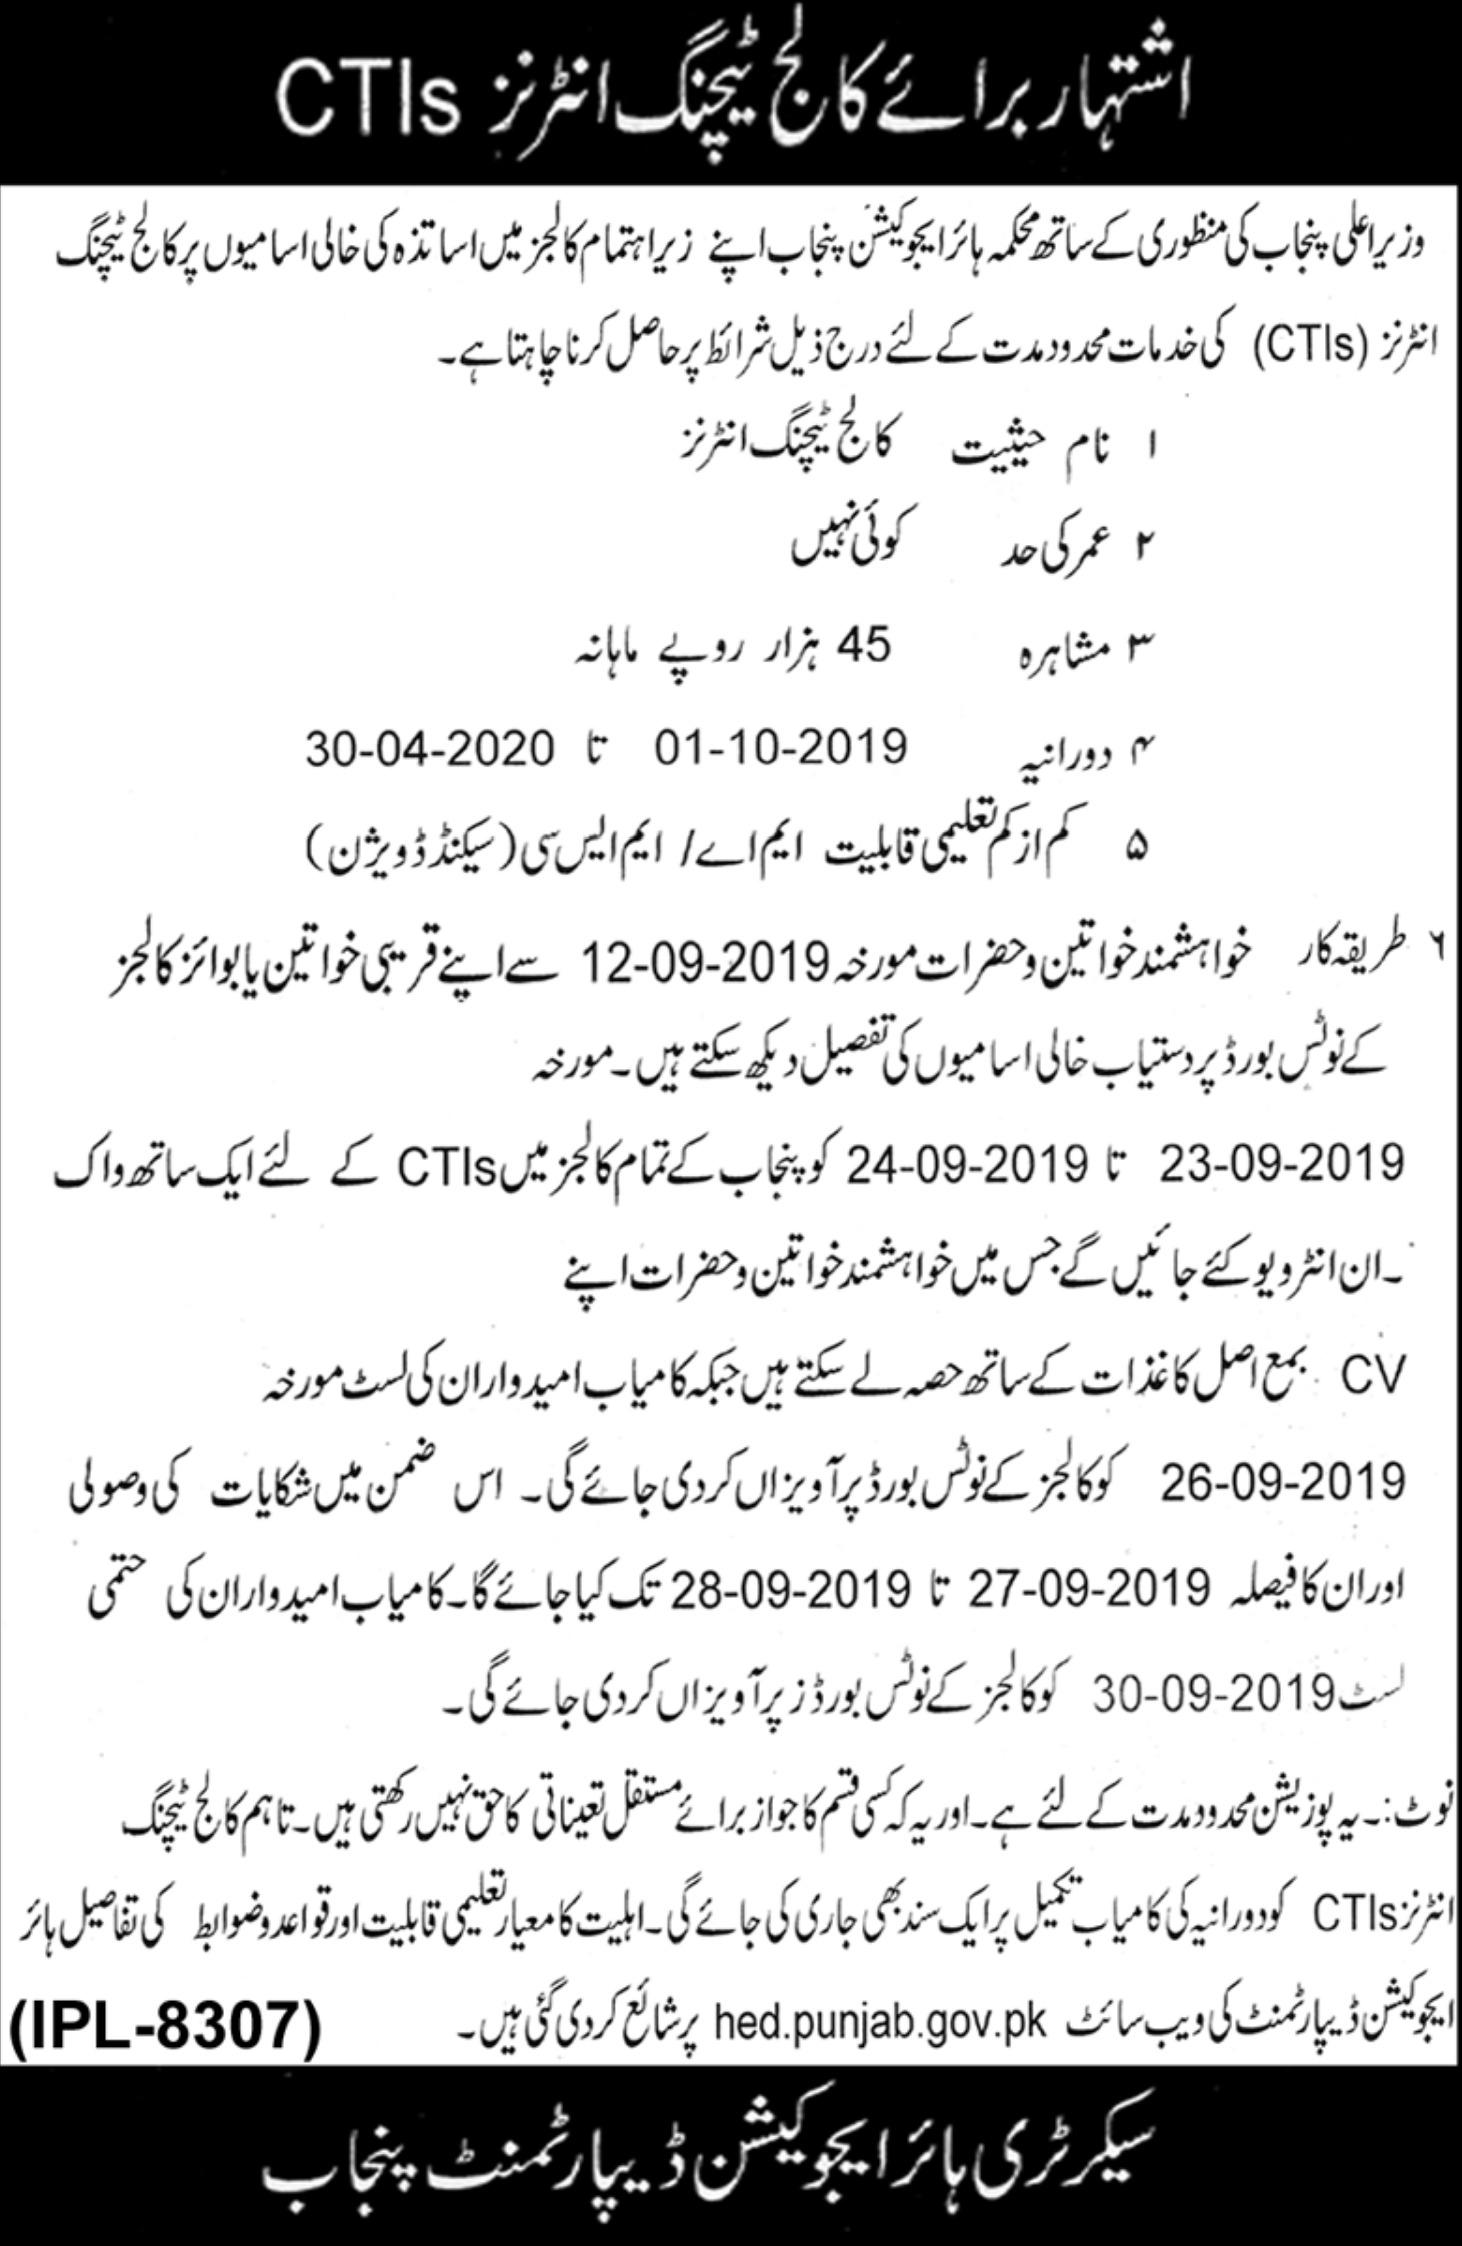 Photo of Higher Education Department Punjab Jobs 2019 For CTIs | 500 Vacancies